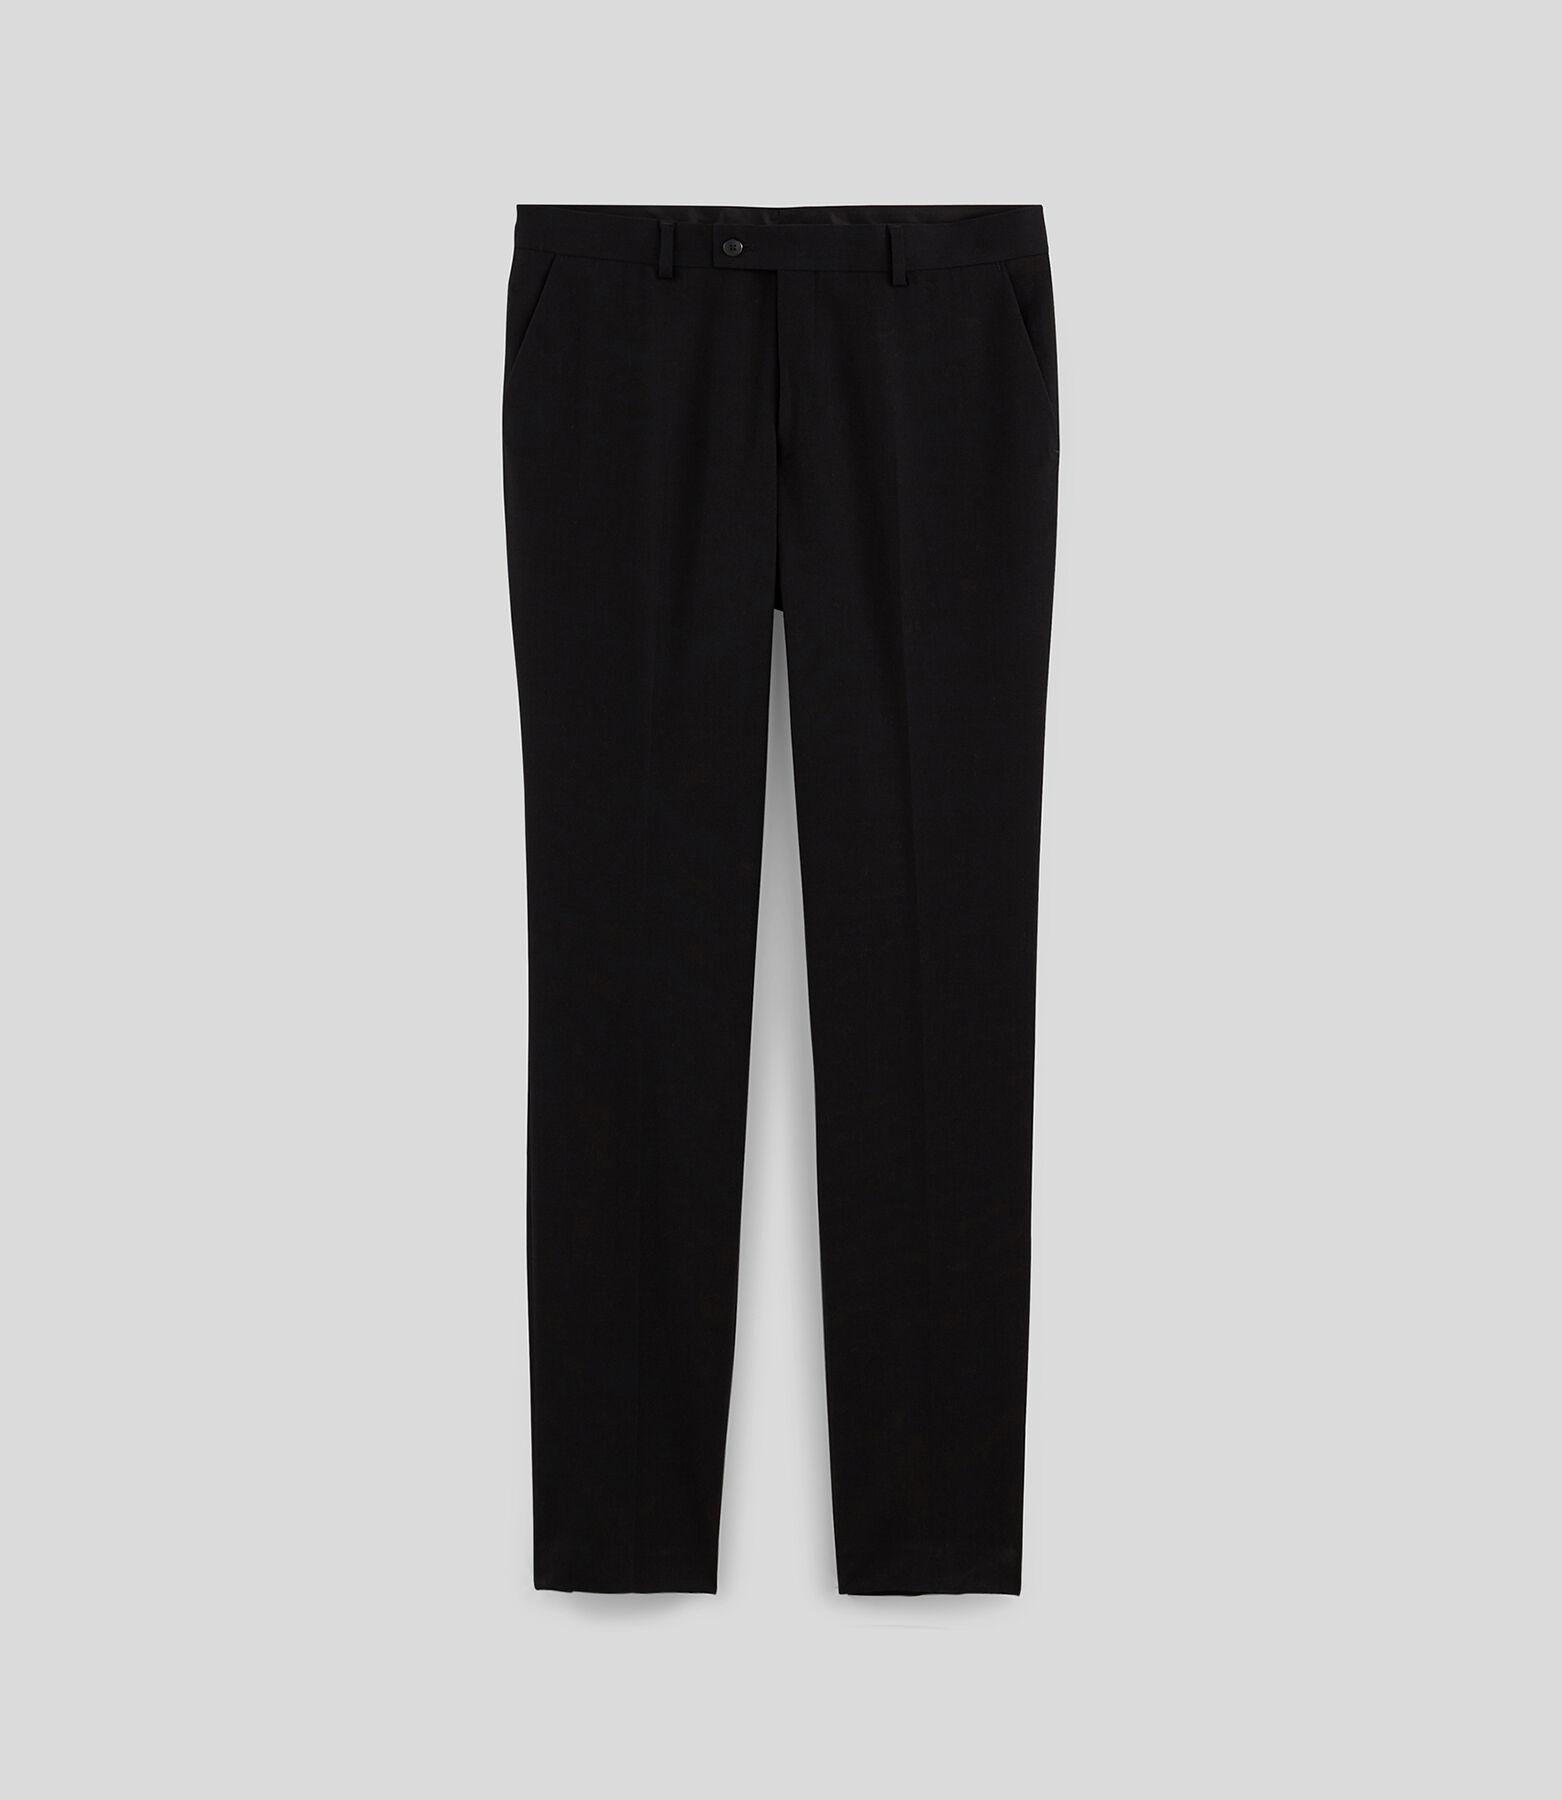 Pantalon Costume Noir